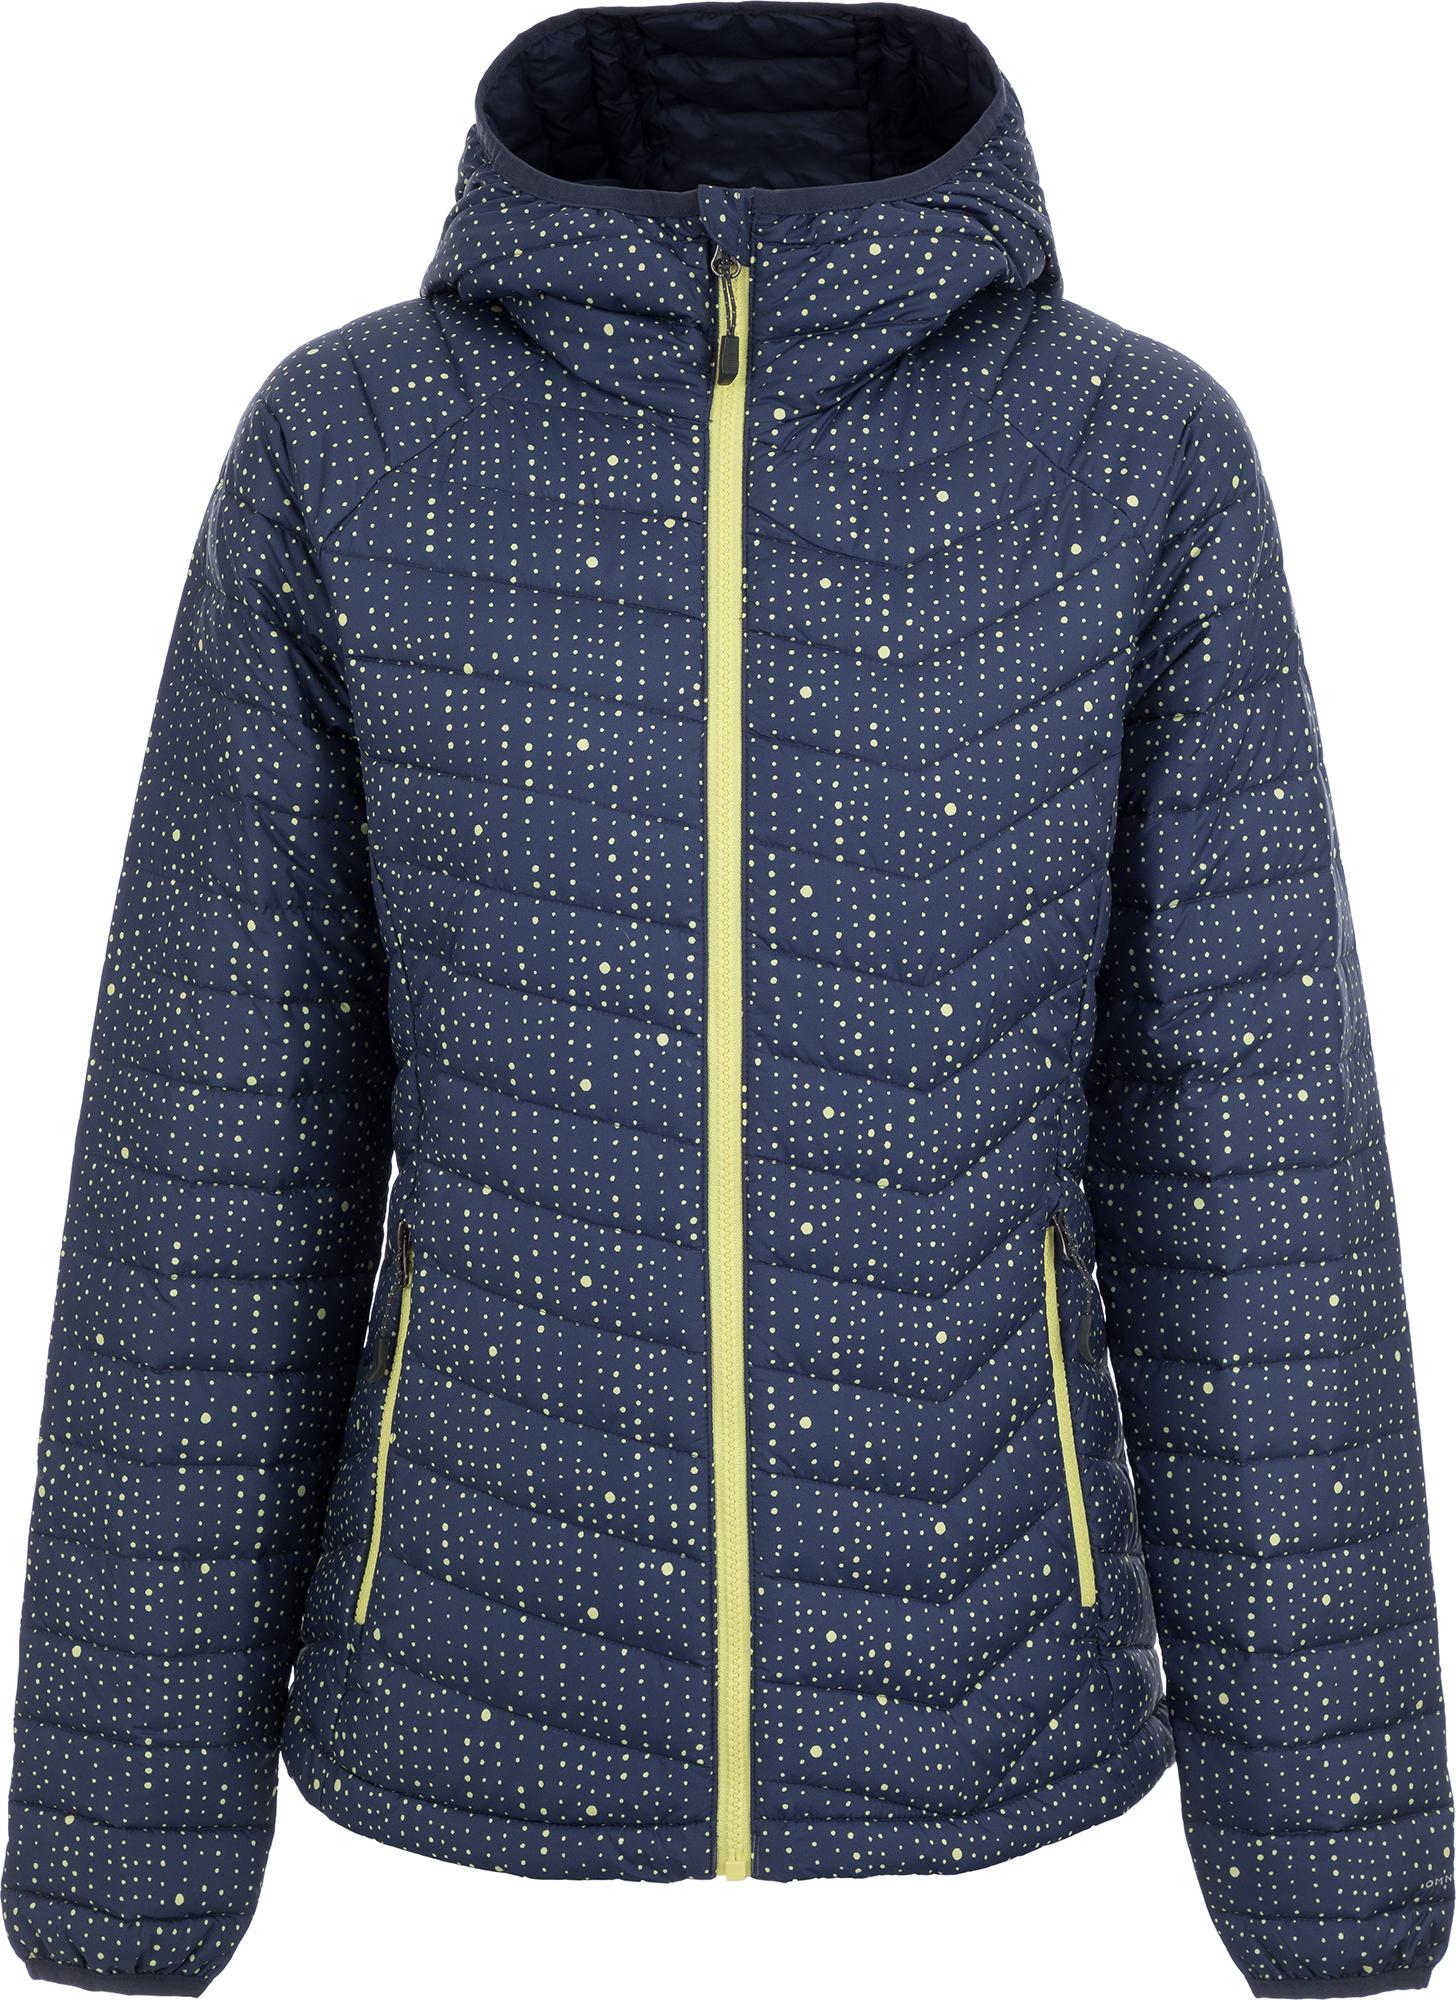 Columbia Куртка утепленная женская Columbia Powder Lite, размер 44 цена